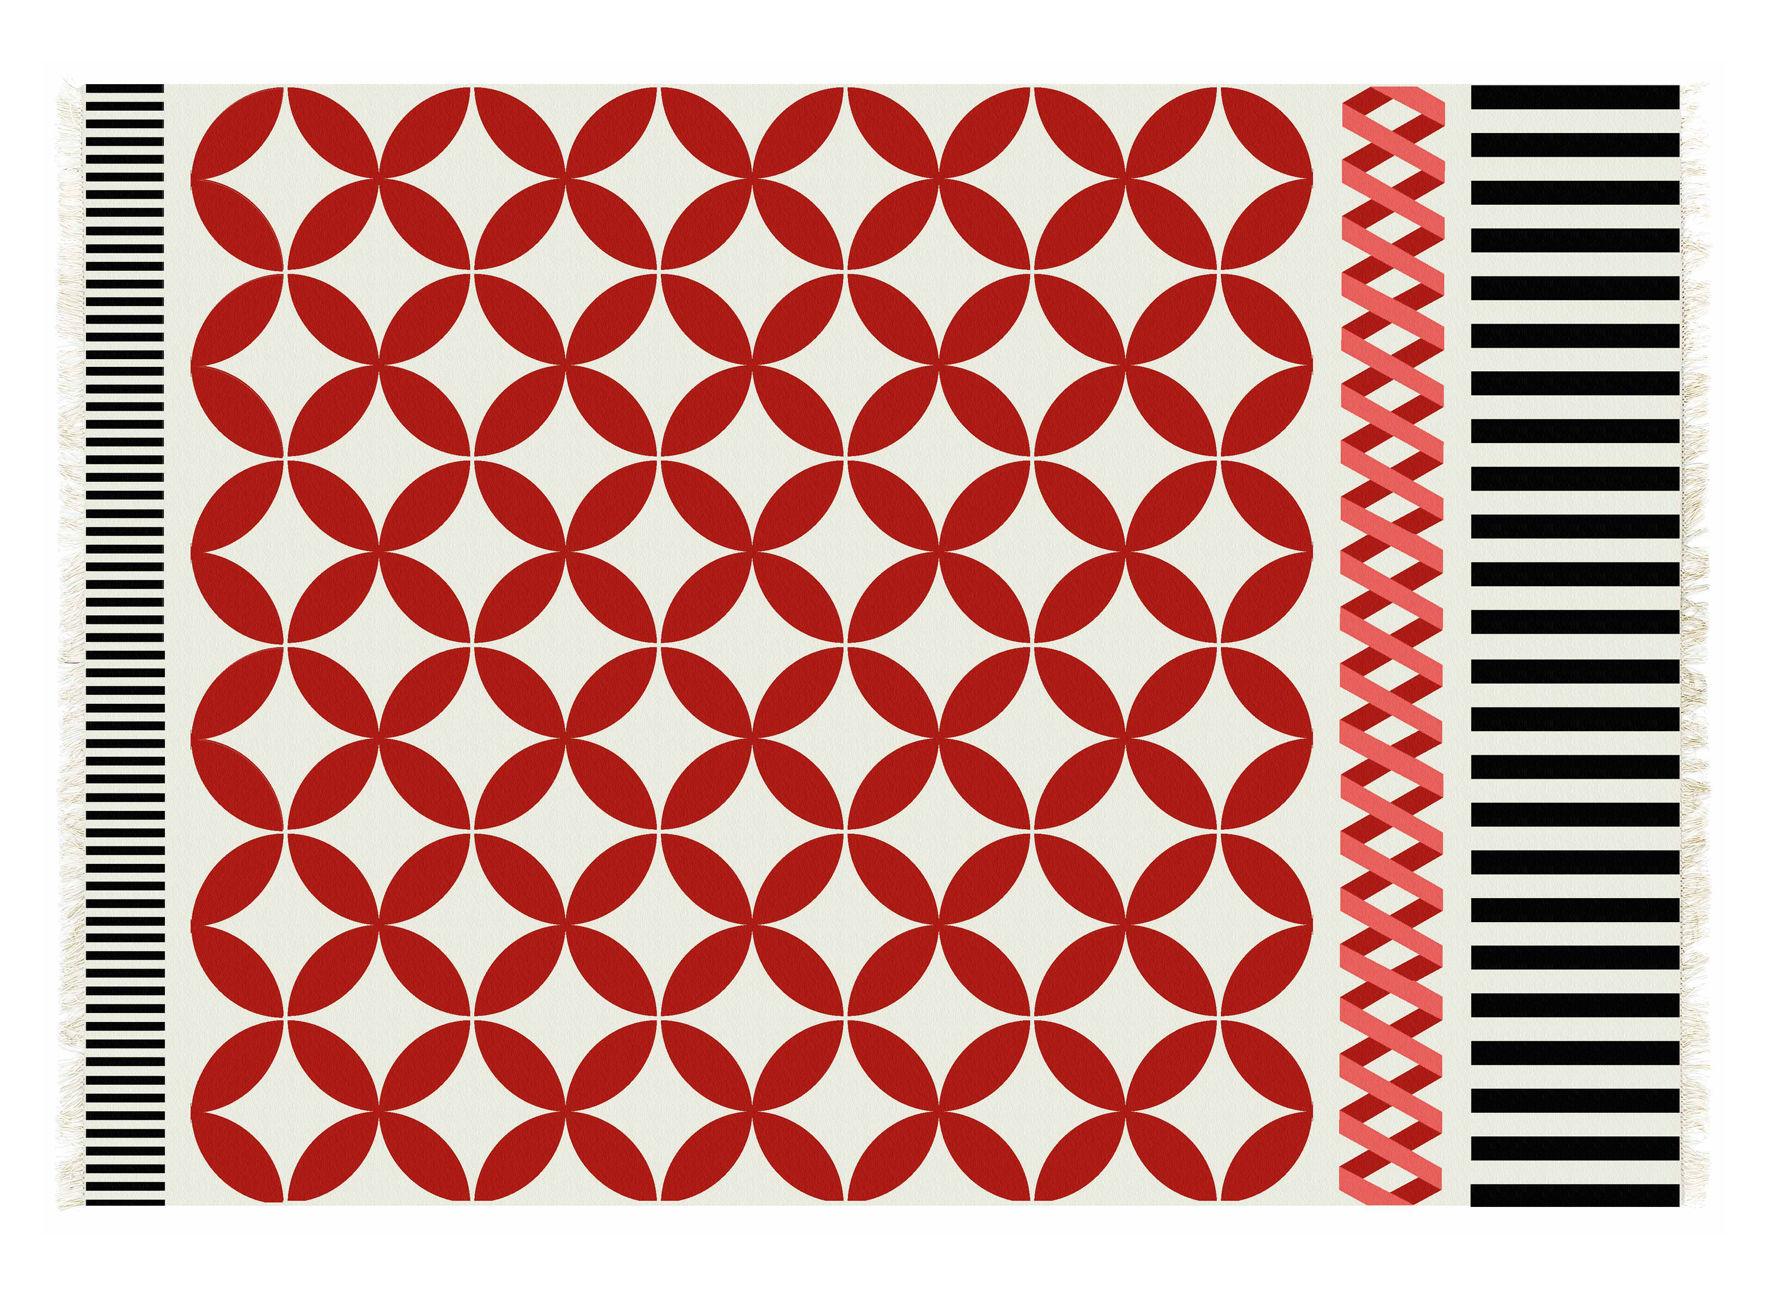 Interni - Tappeti - Tappeto Kilim Catania - / 240 x 170 cm di Gan - Rosso - Lana vergine